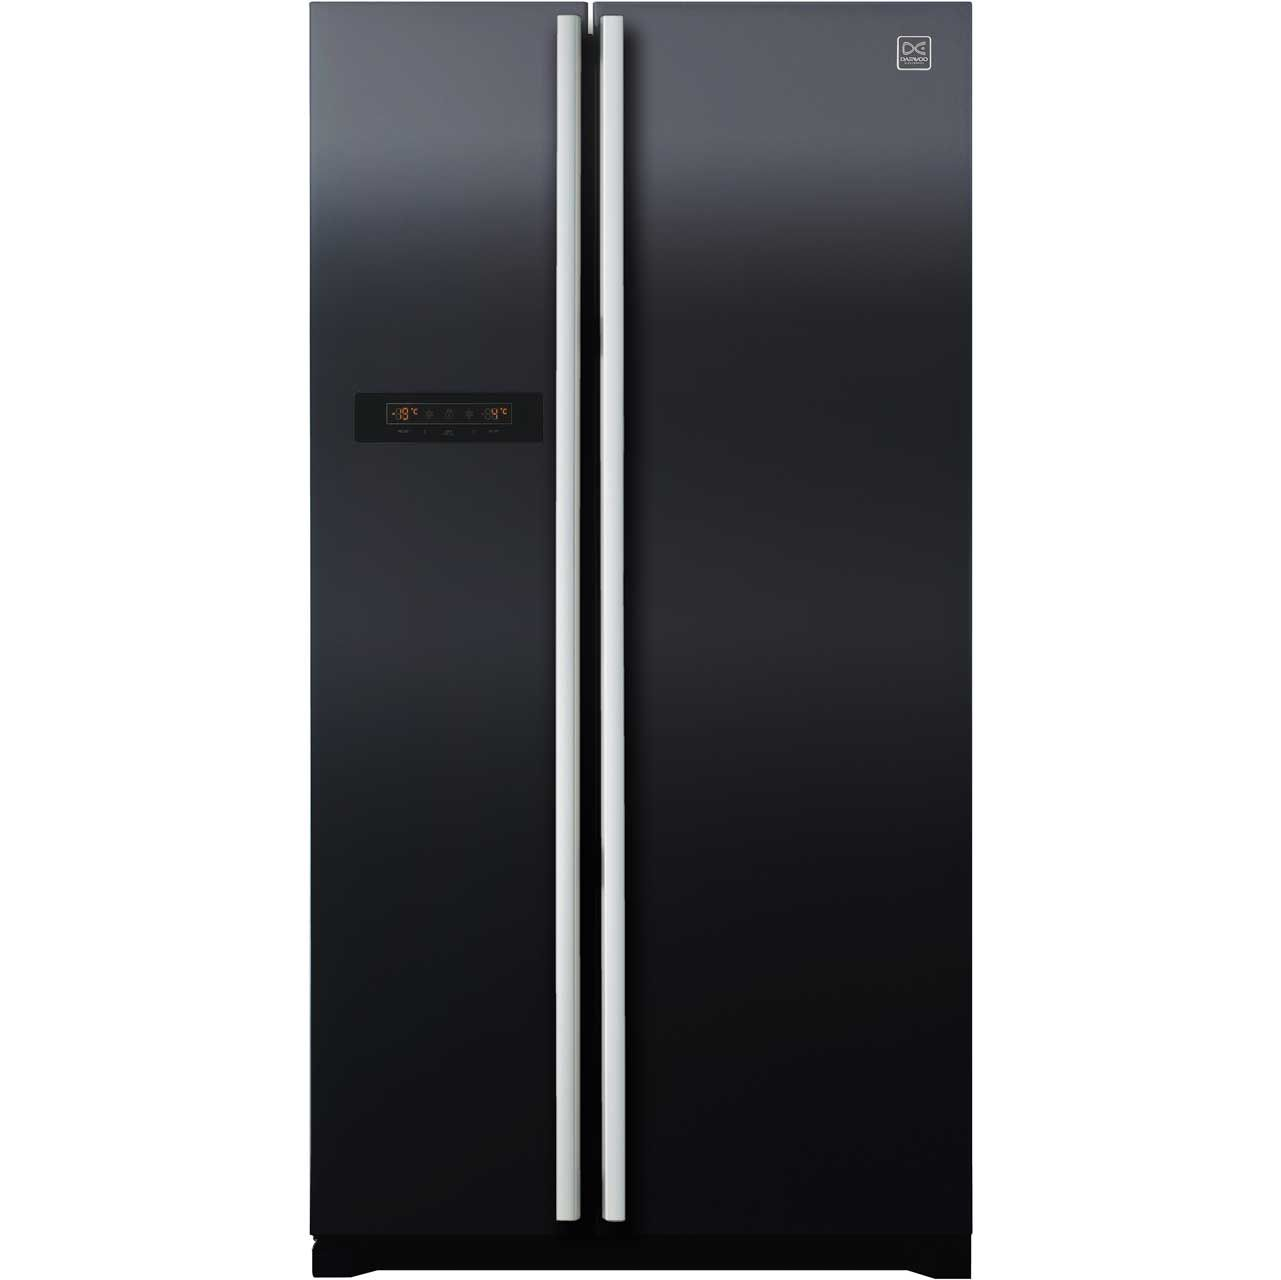 Daewoo FRAX22B3B American Fridge Freezer - Black | Kitchen ...